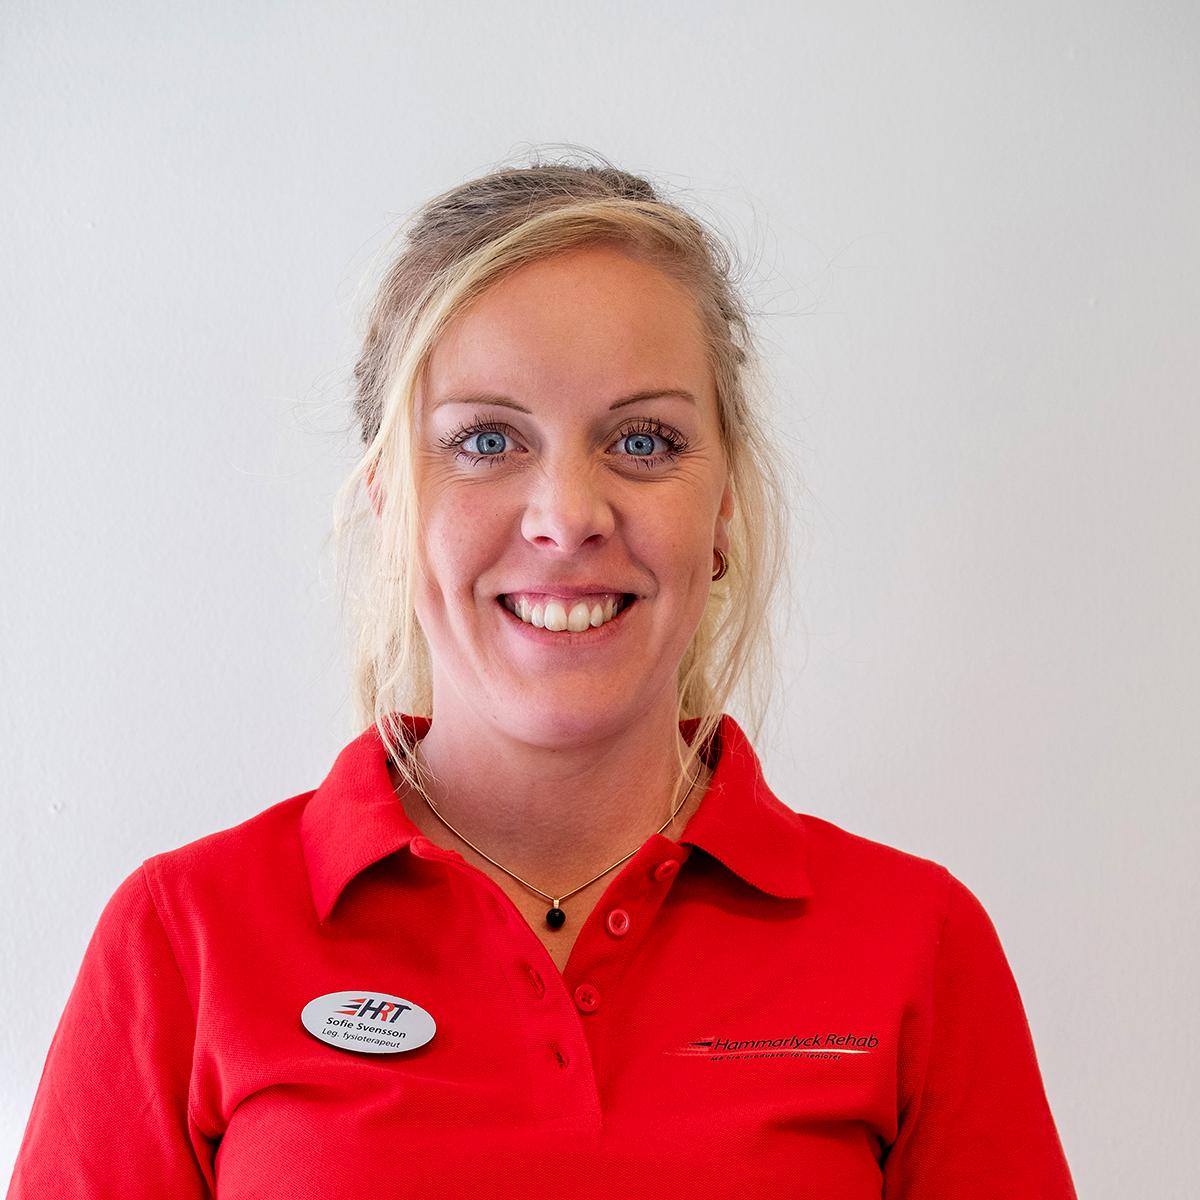 Sofie svensson Leg. fysioterapeut